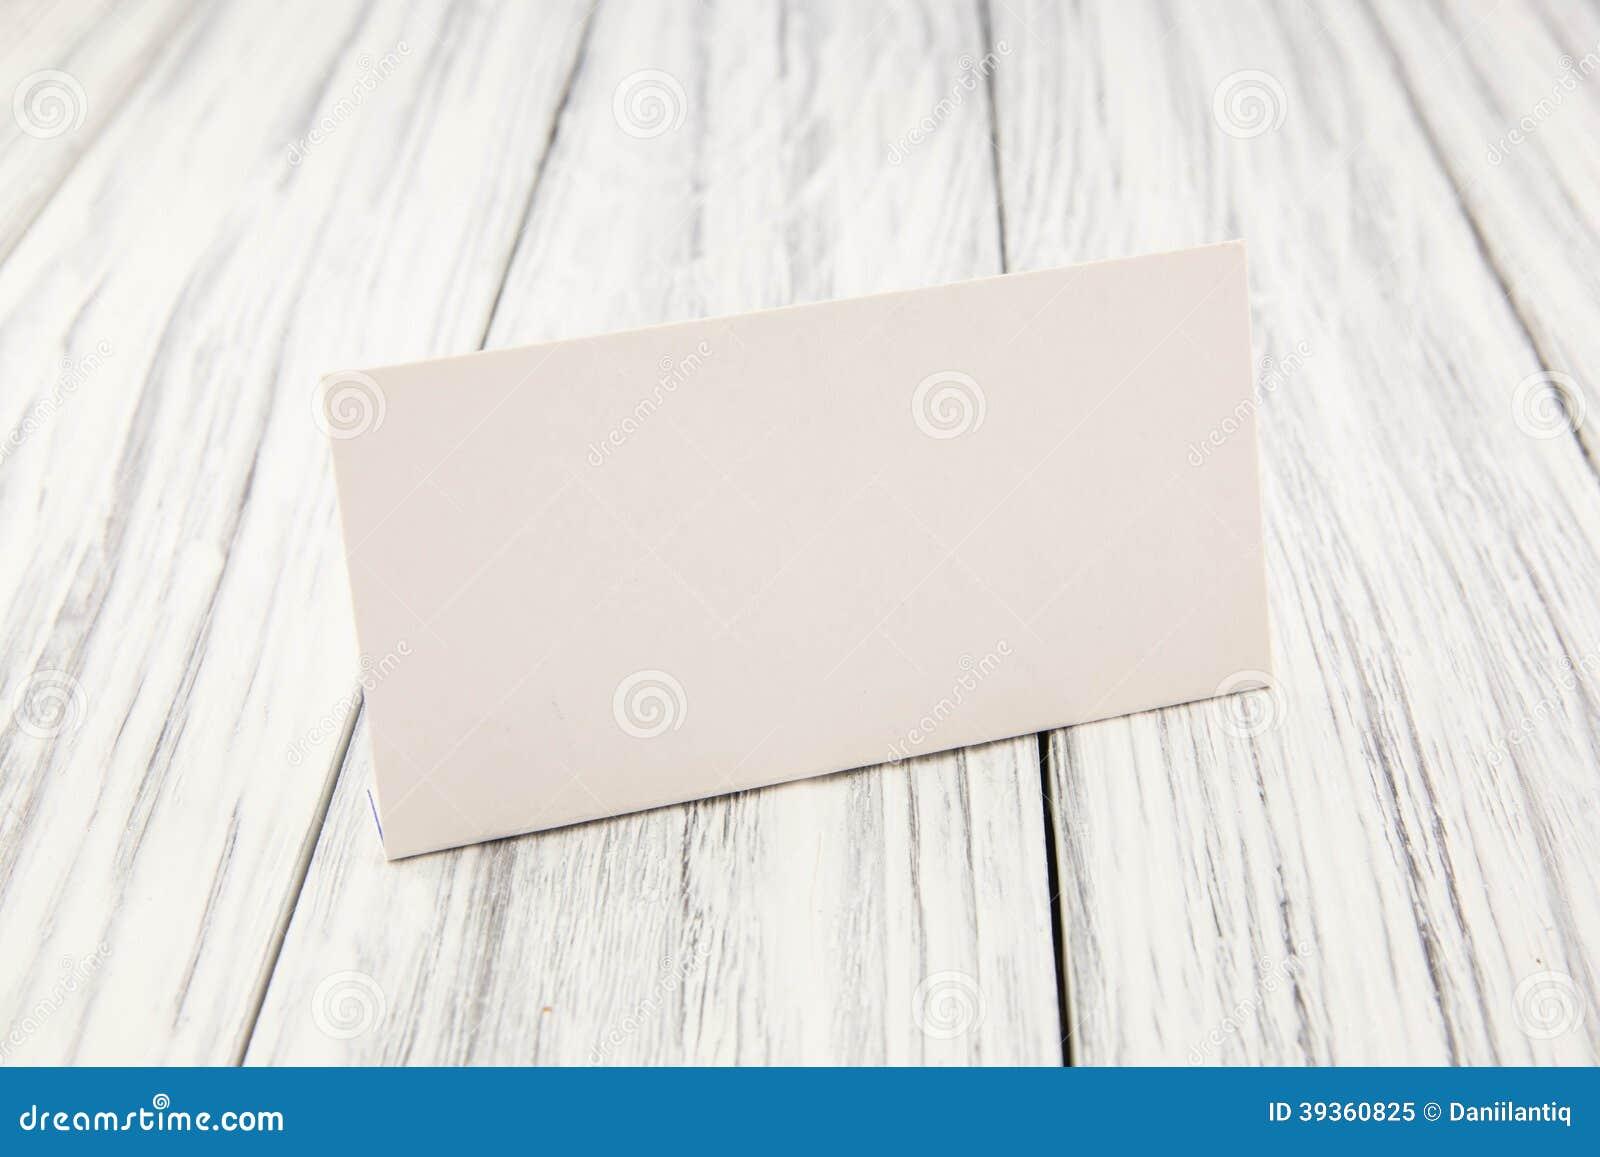 paper nameplate stock image image of interior design 39360825